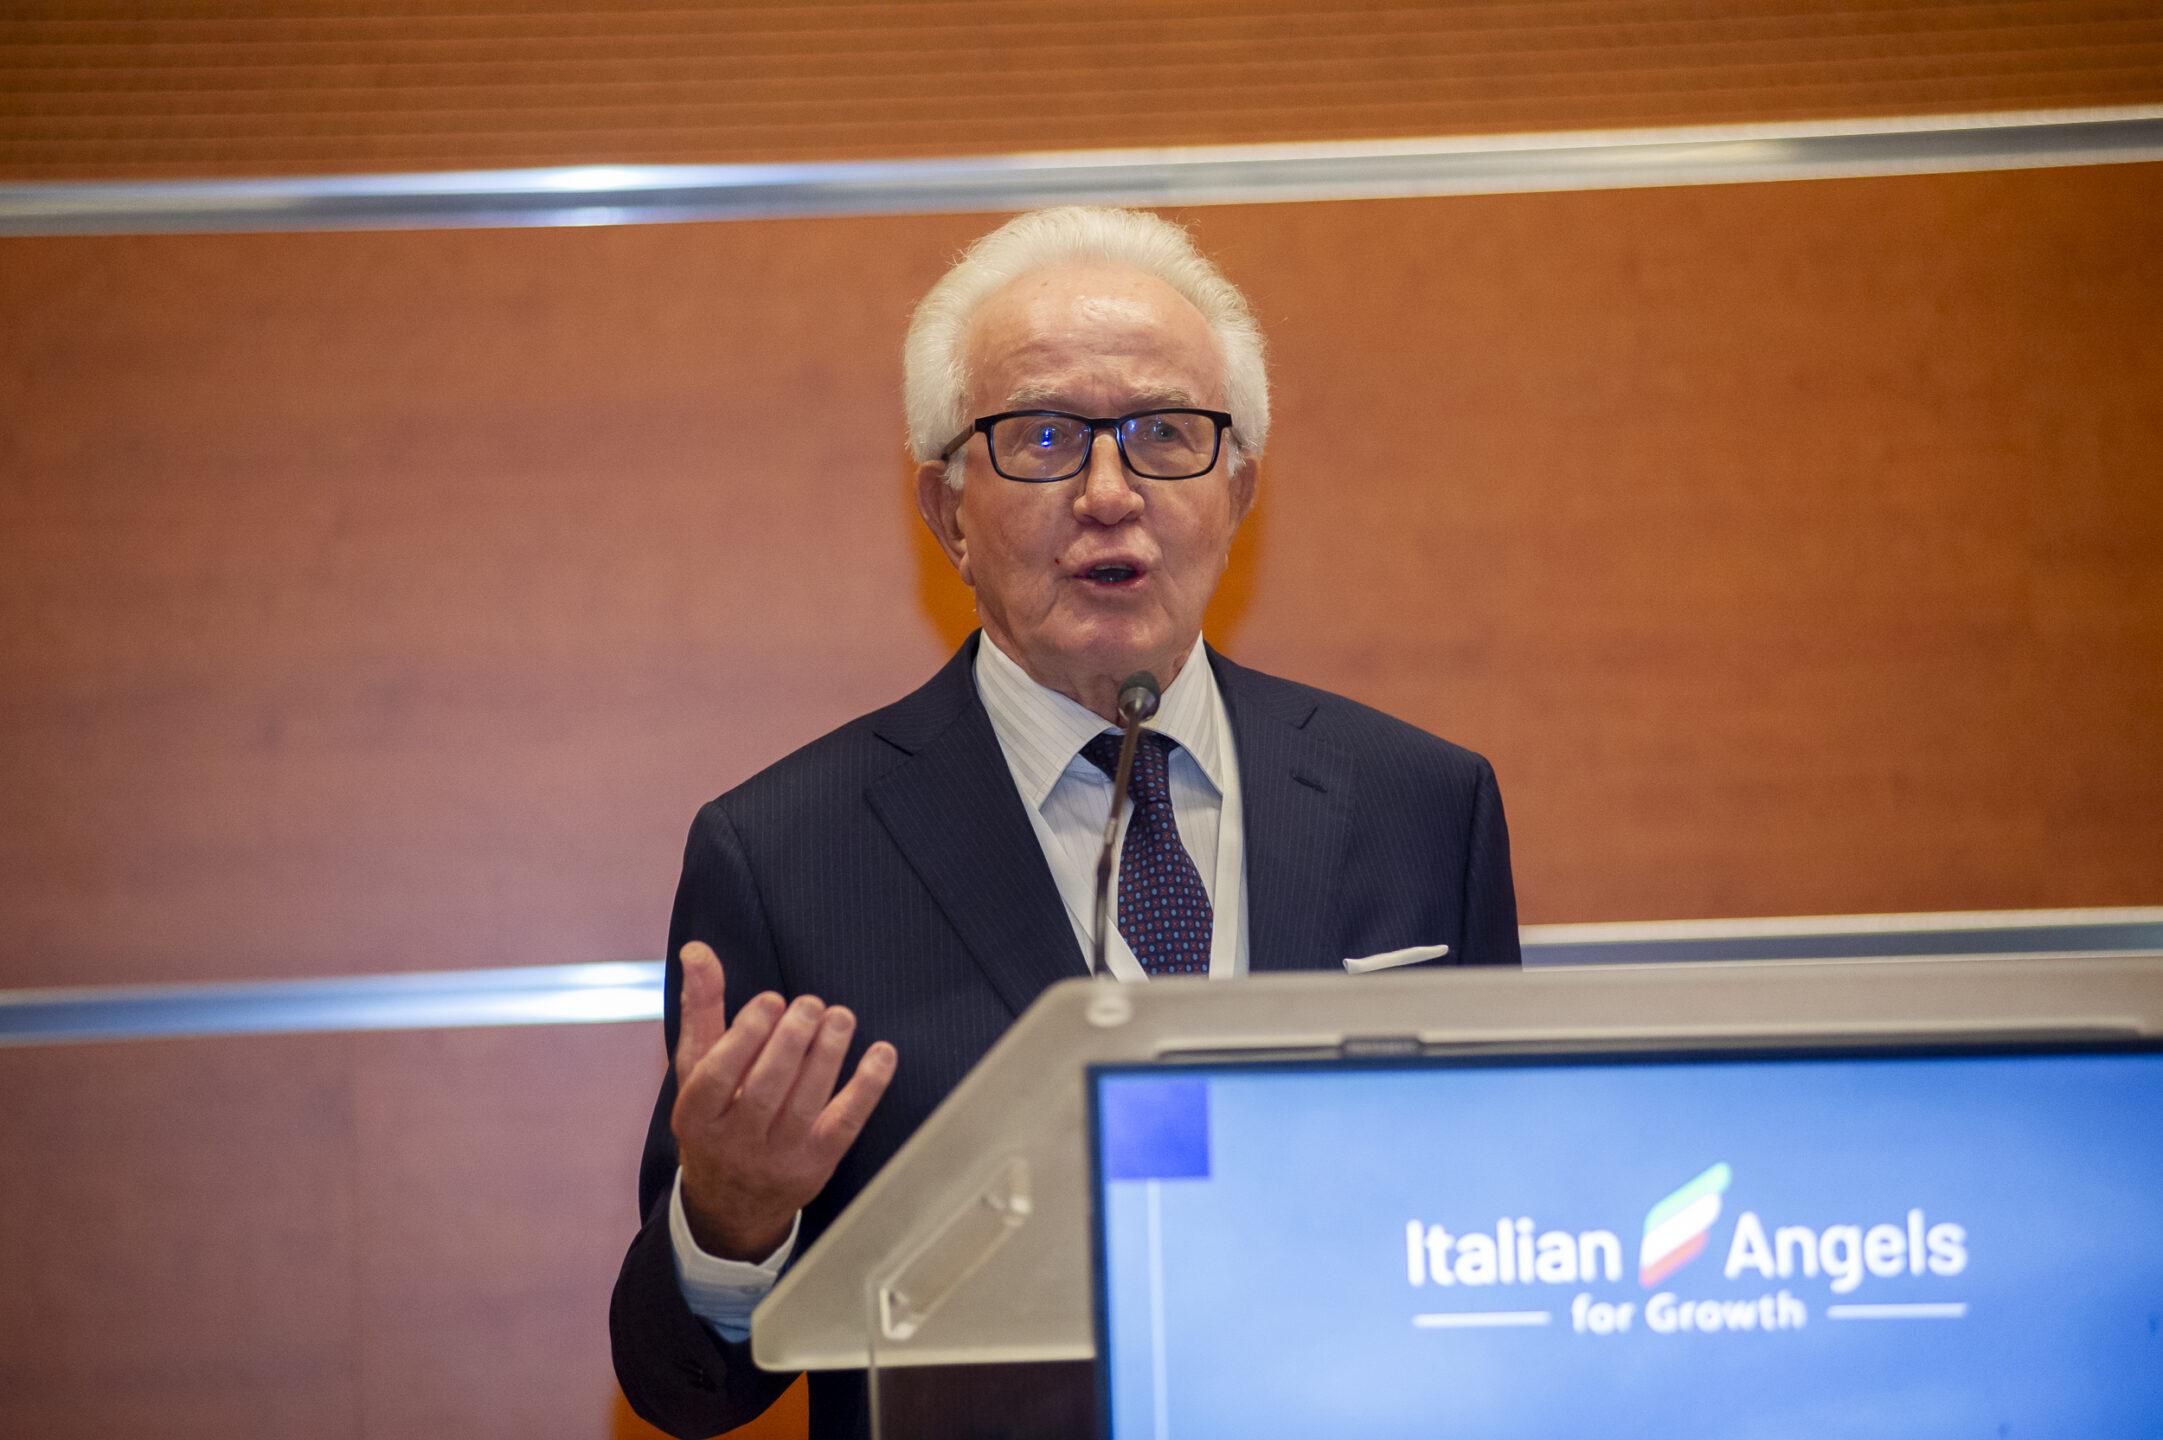 Startup italiane: Antonio Leone, presidente Italian Angels for Growth